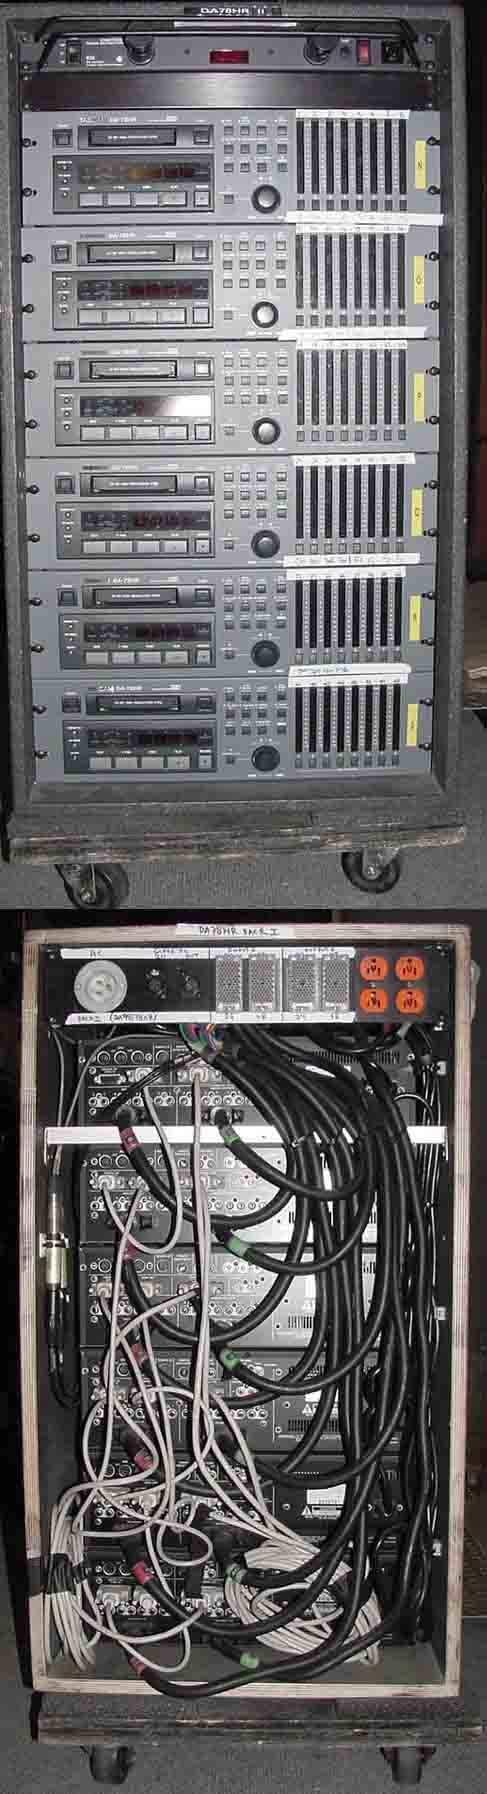 Steve, wiring racks and organization - Gearz on transmission rack, conduit rack, controller rack, switch rack, cable rack, dart rack, power rack, painting rack, audio rack, wood rack, hollywood rack, harness rack, electrical rack,